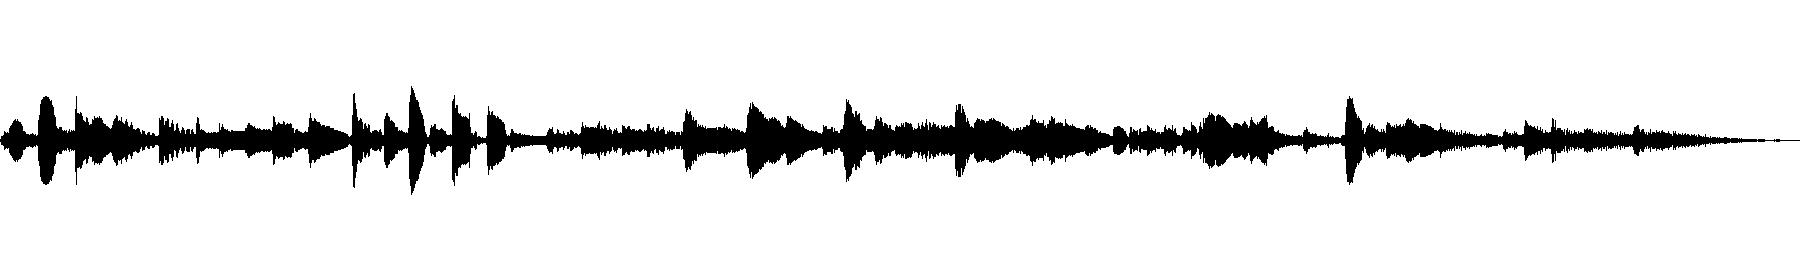 arab riff 1